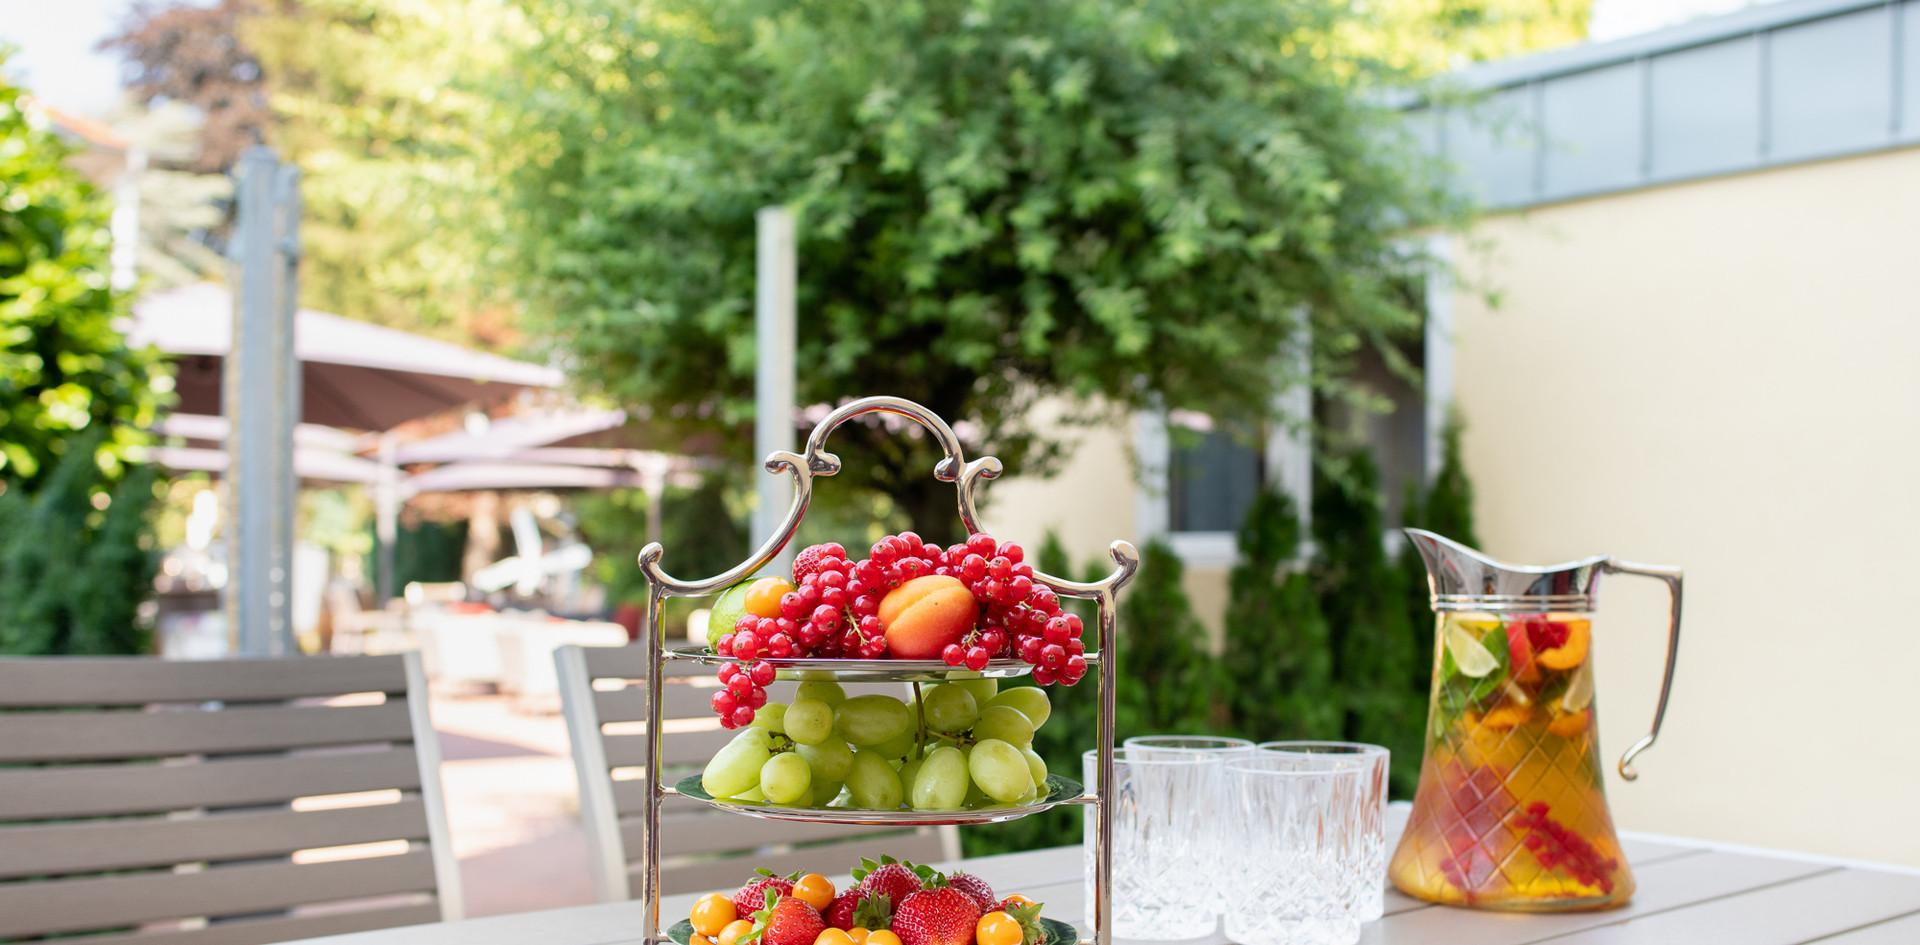 Sommererfrischung Hotel Wegner - The culinary Art Hotel